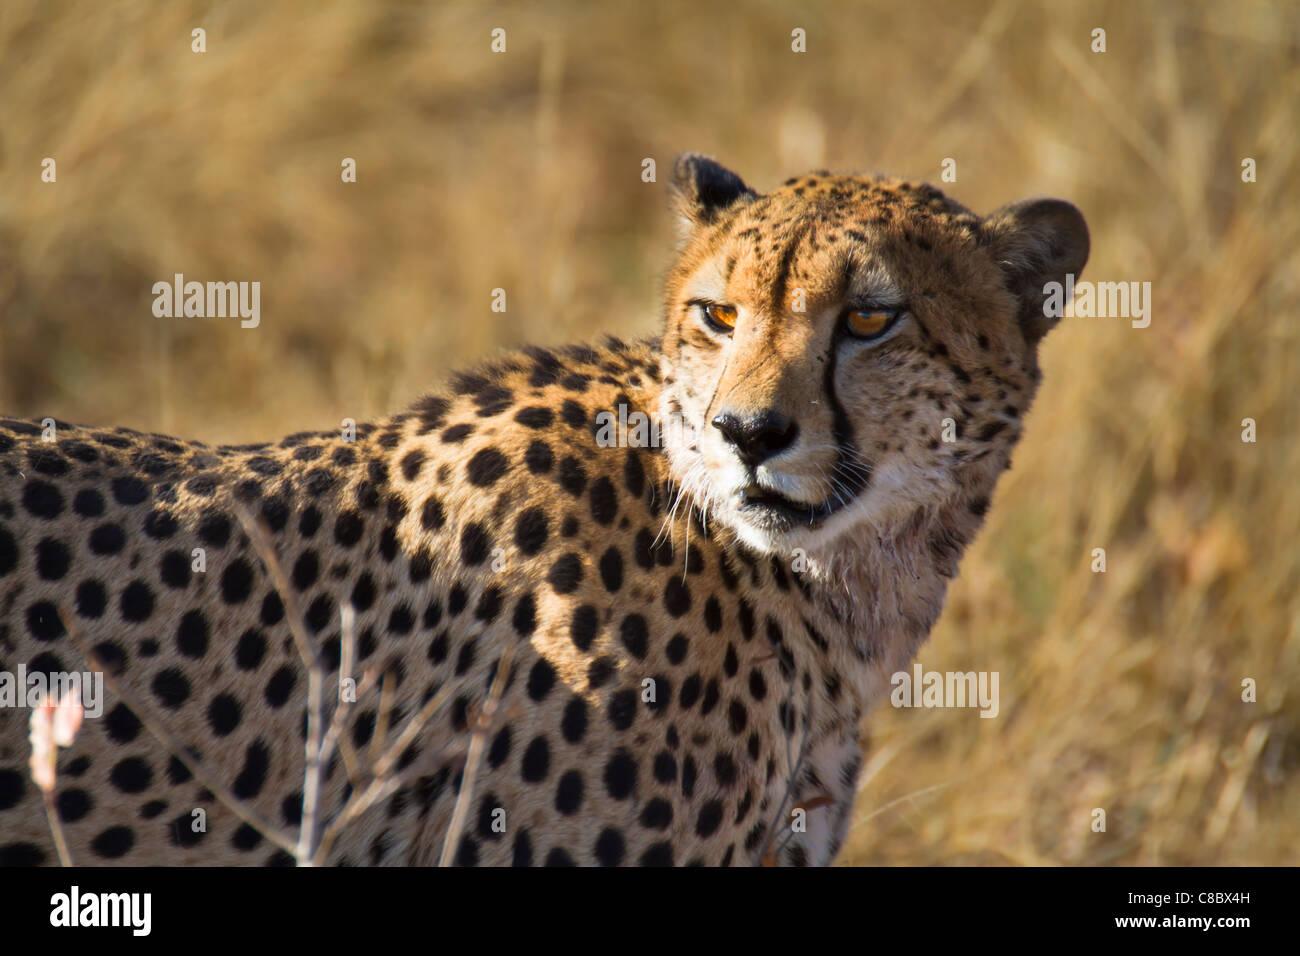 Cheetah nel Parco Nazionale di Hwange, Zimbabwe Immagini Stock